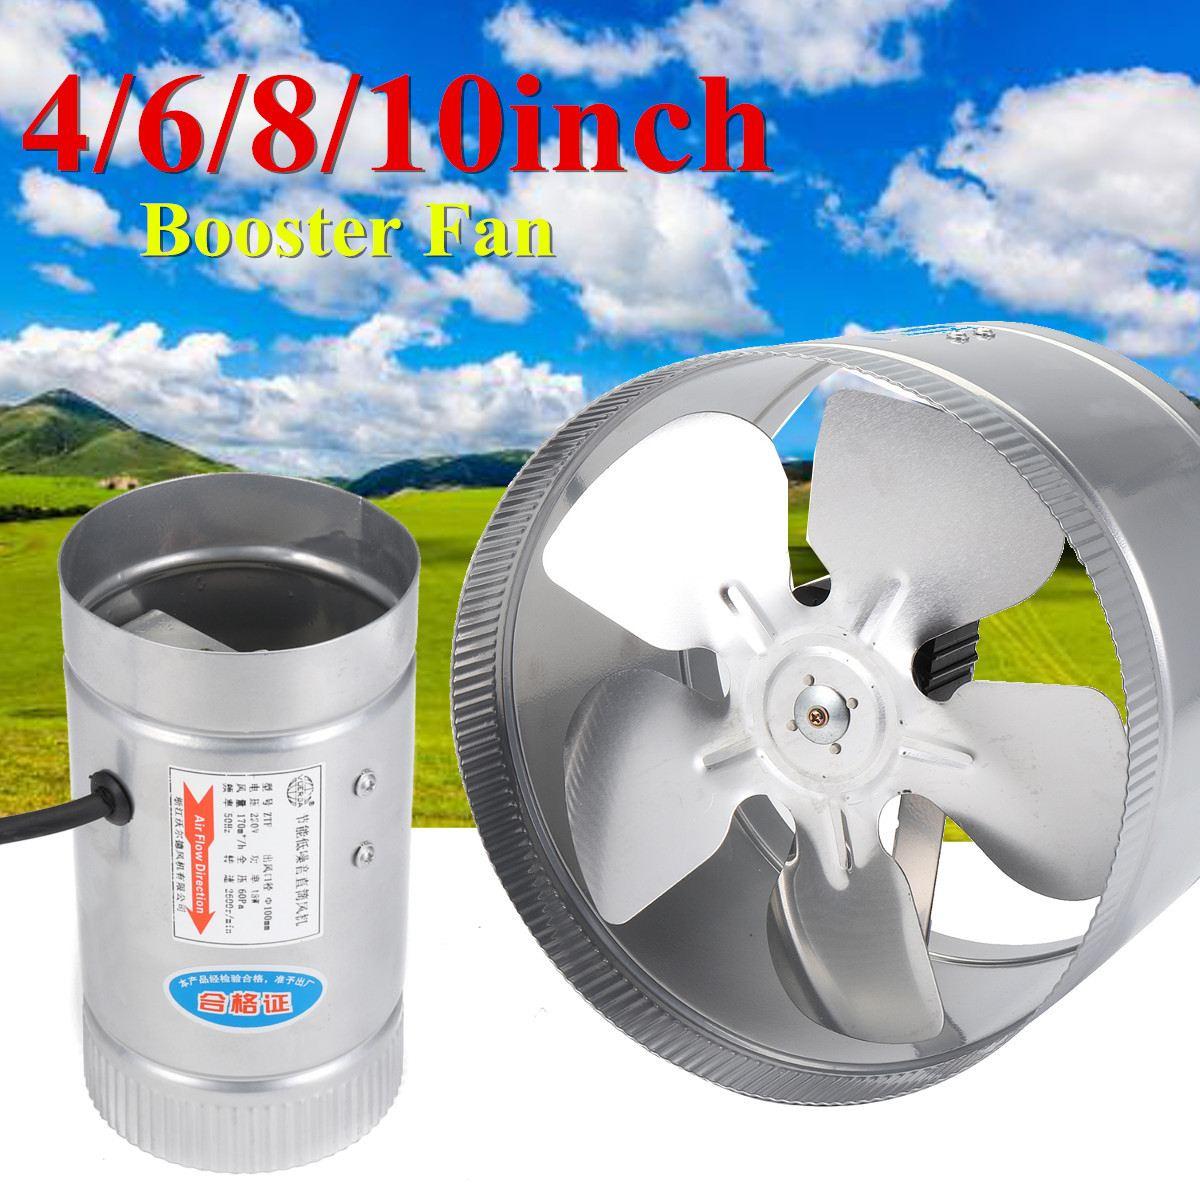 Metal Booster Fan Ventilator 4/6/8/10 Inch Inline Air Ducting Fan Blower Intake Out-Take Vents Kitchen Bathroom Ventilation